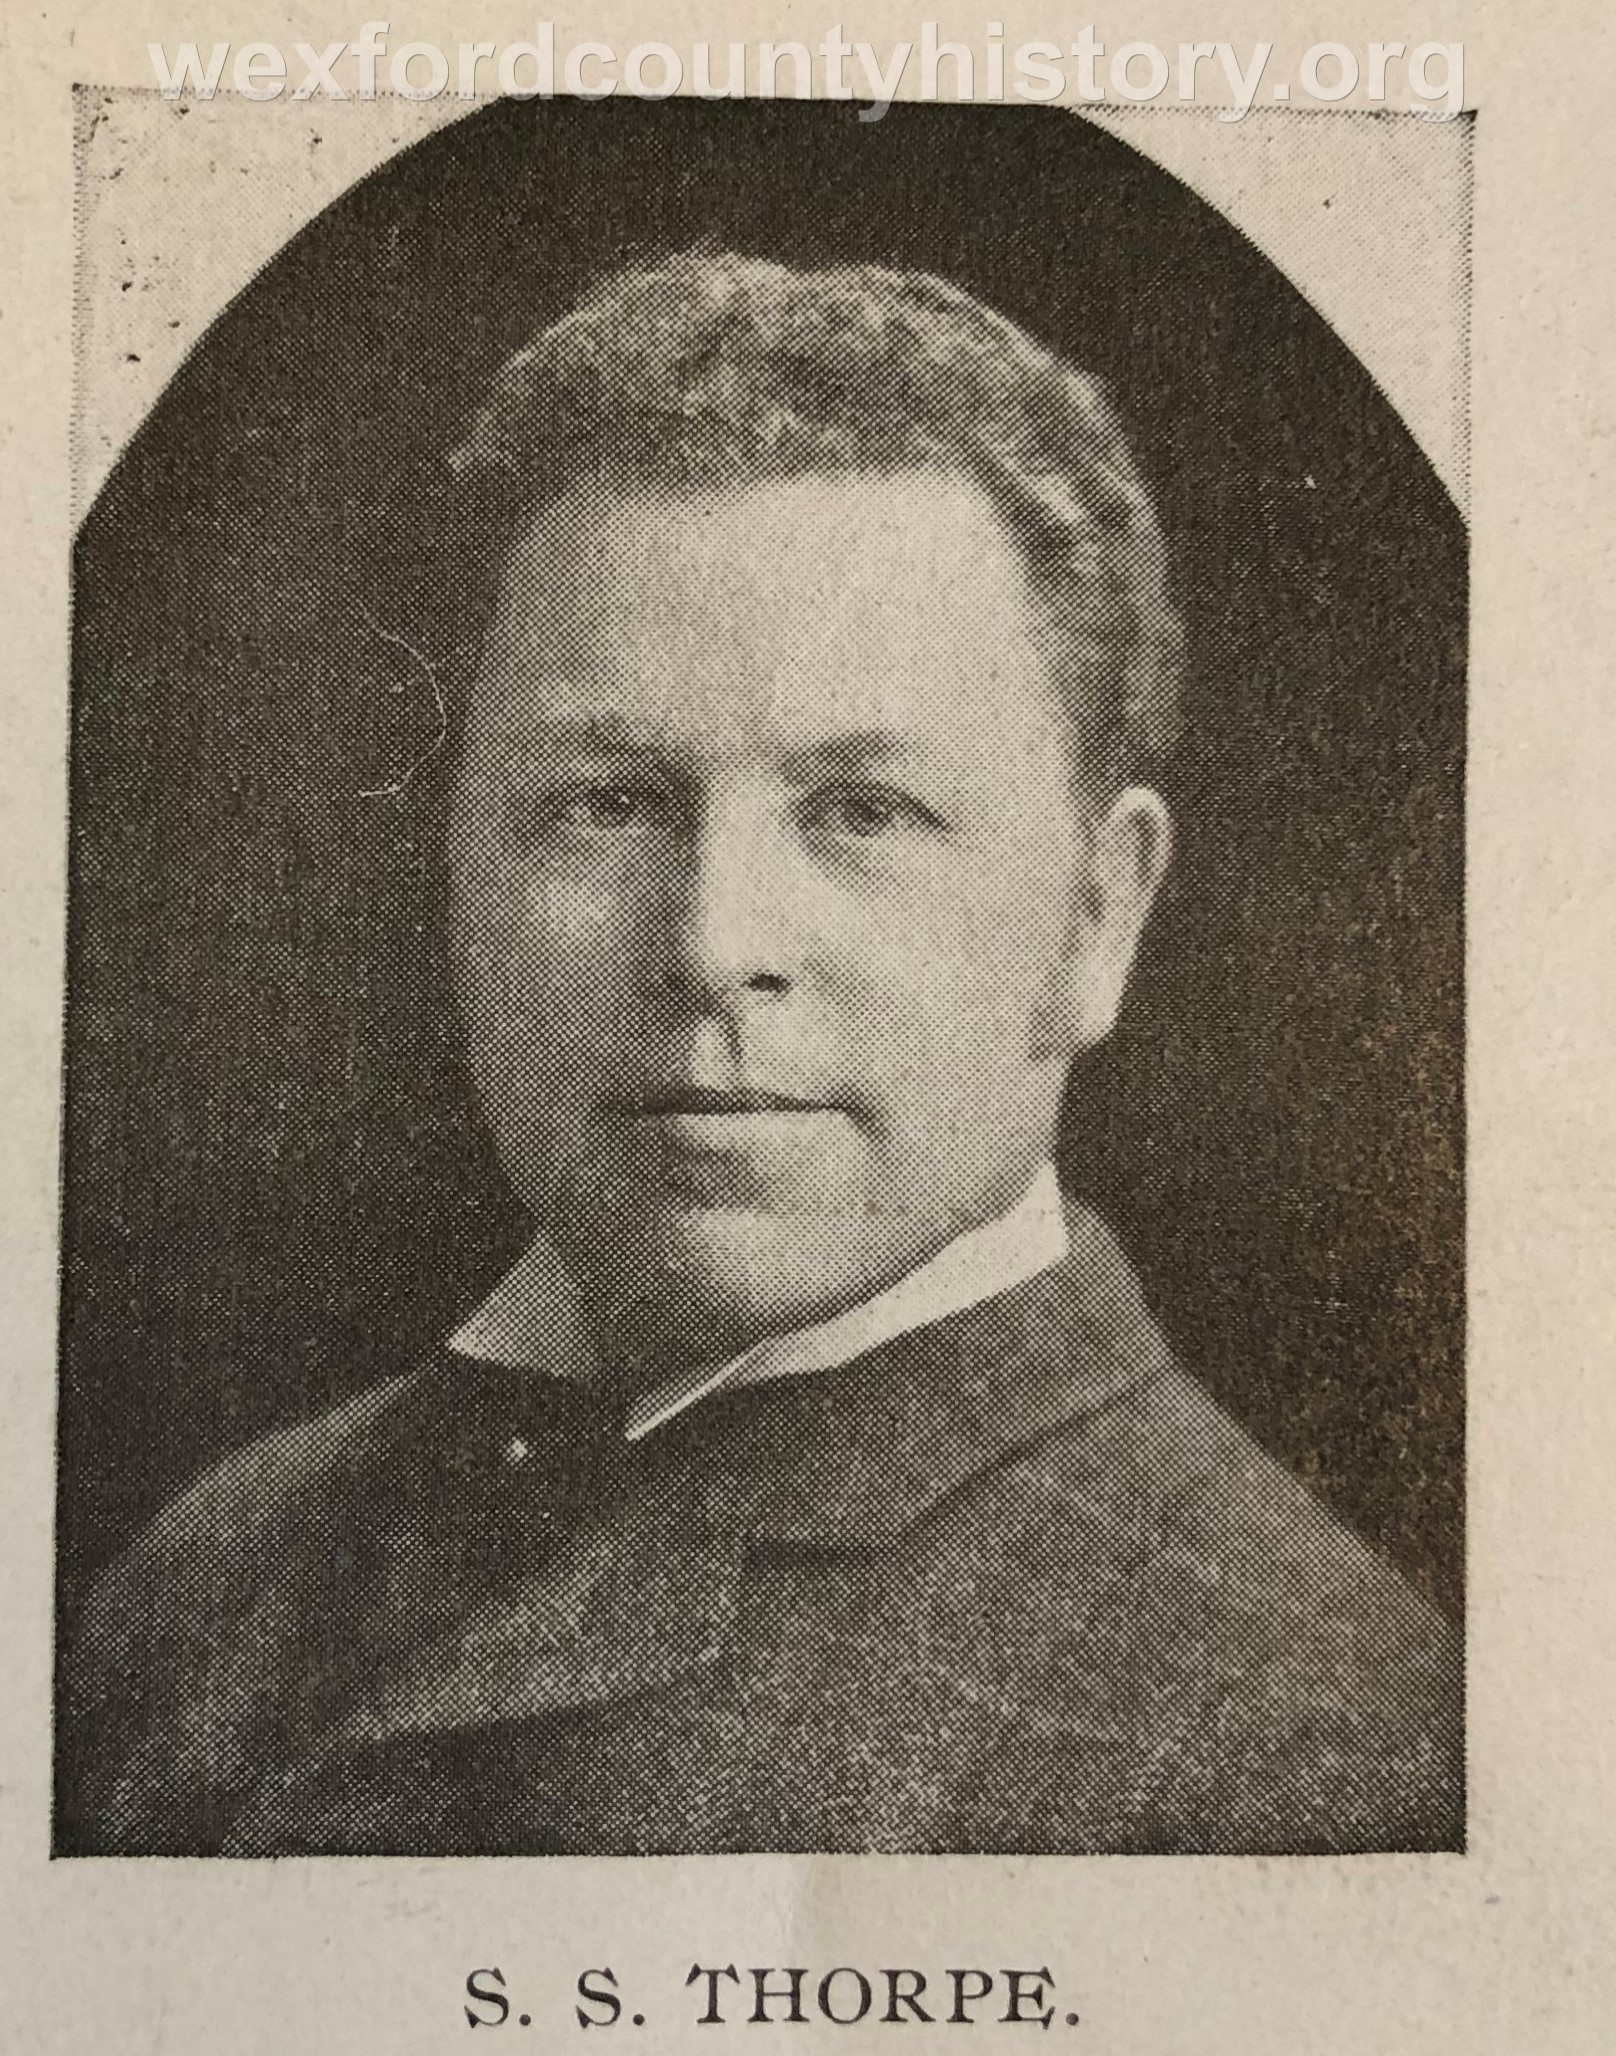 S. S. Thorpe